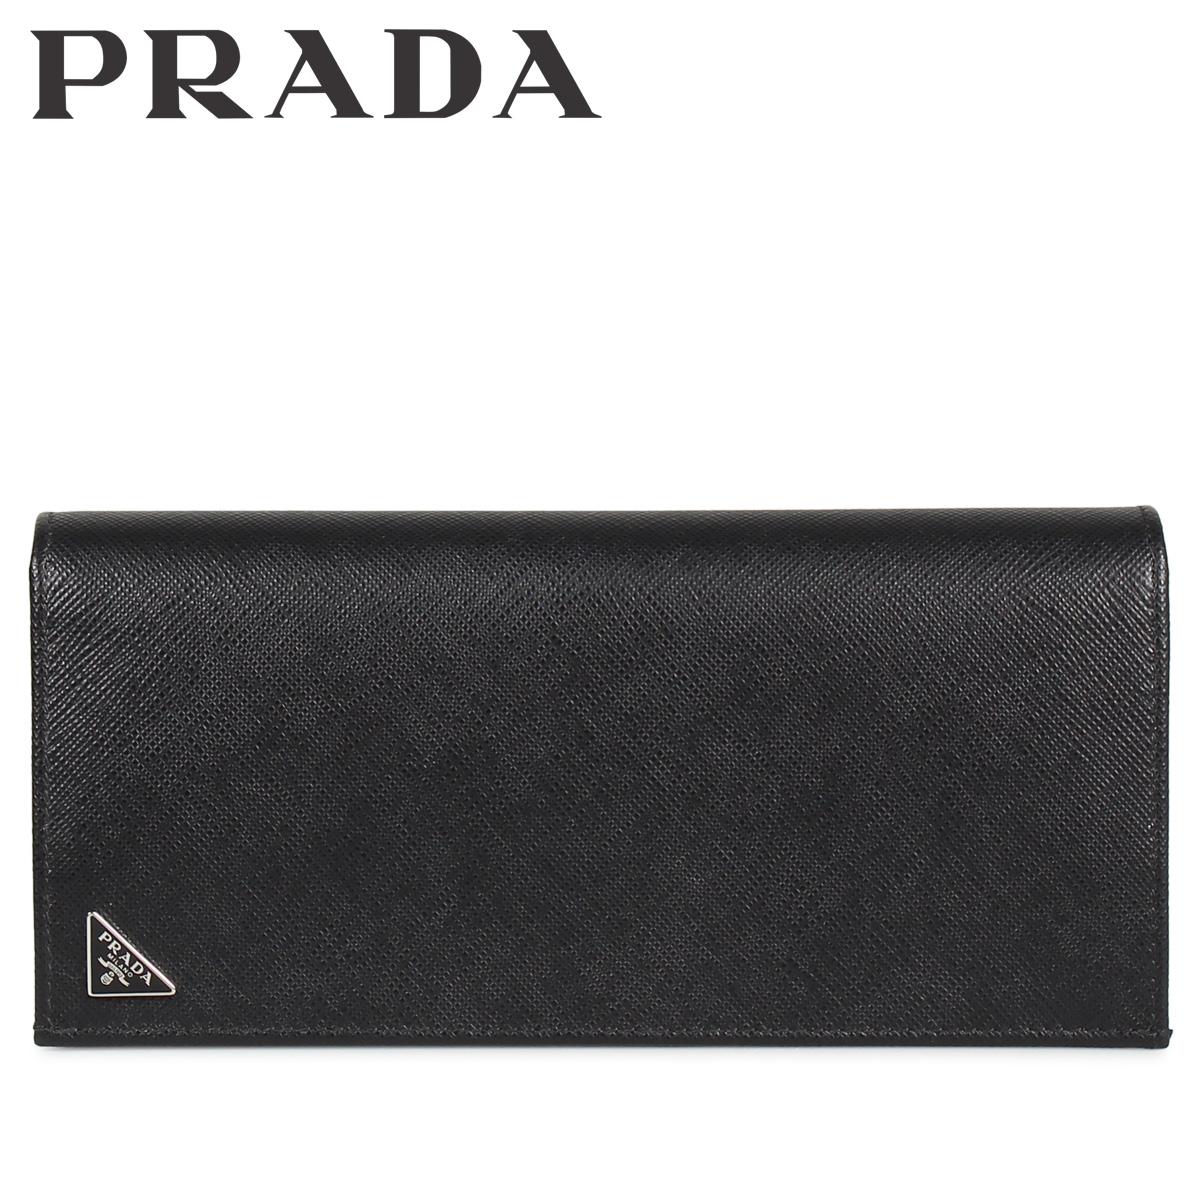 PRADA VERTICAL WALLET プラダ 財布 長財布 メンズ サフィアーノ ブラック 黒 2MV836QHH